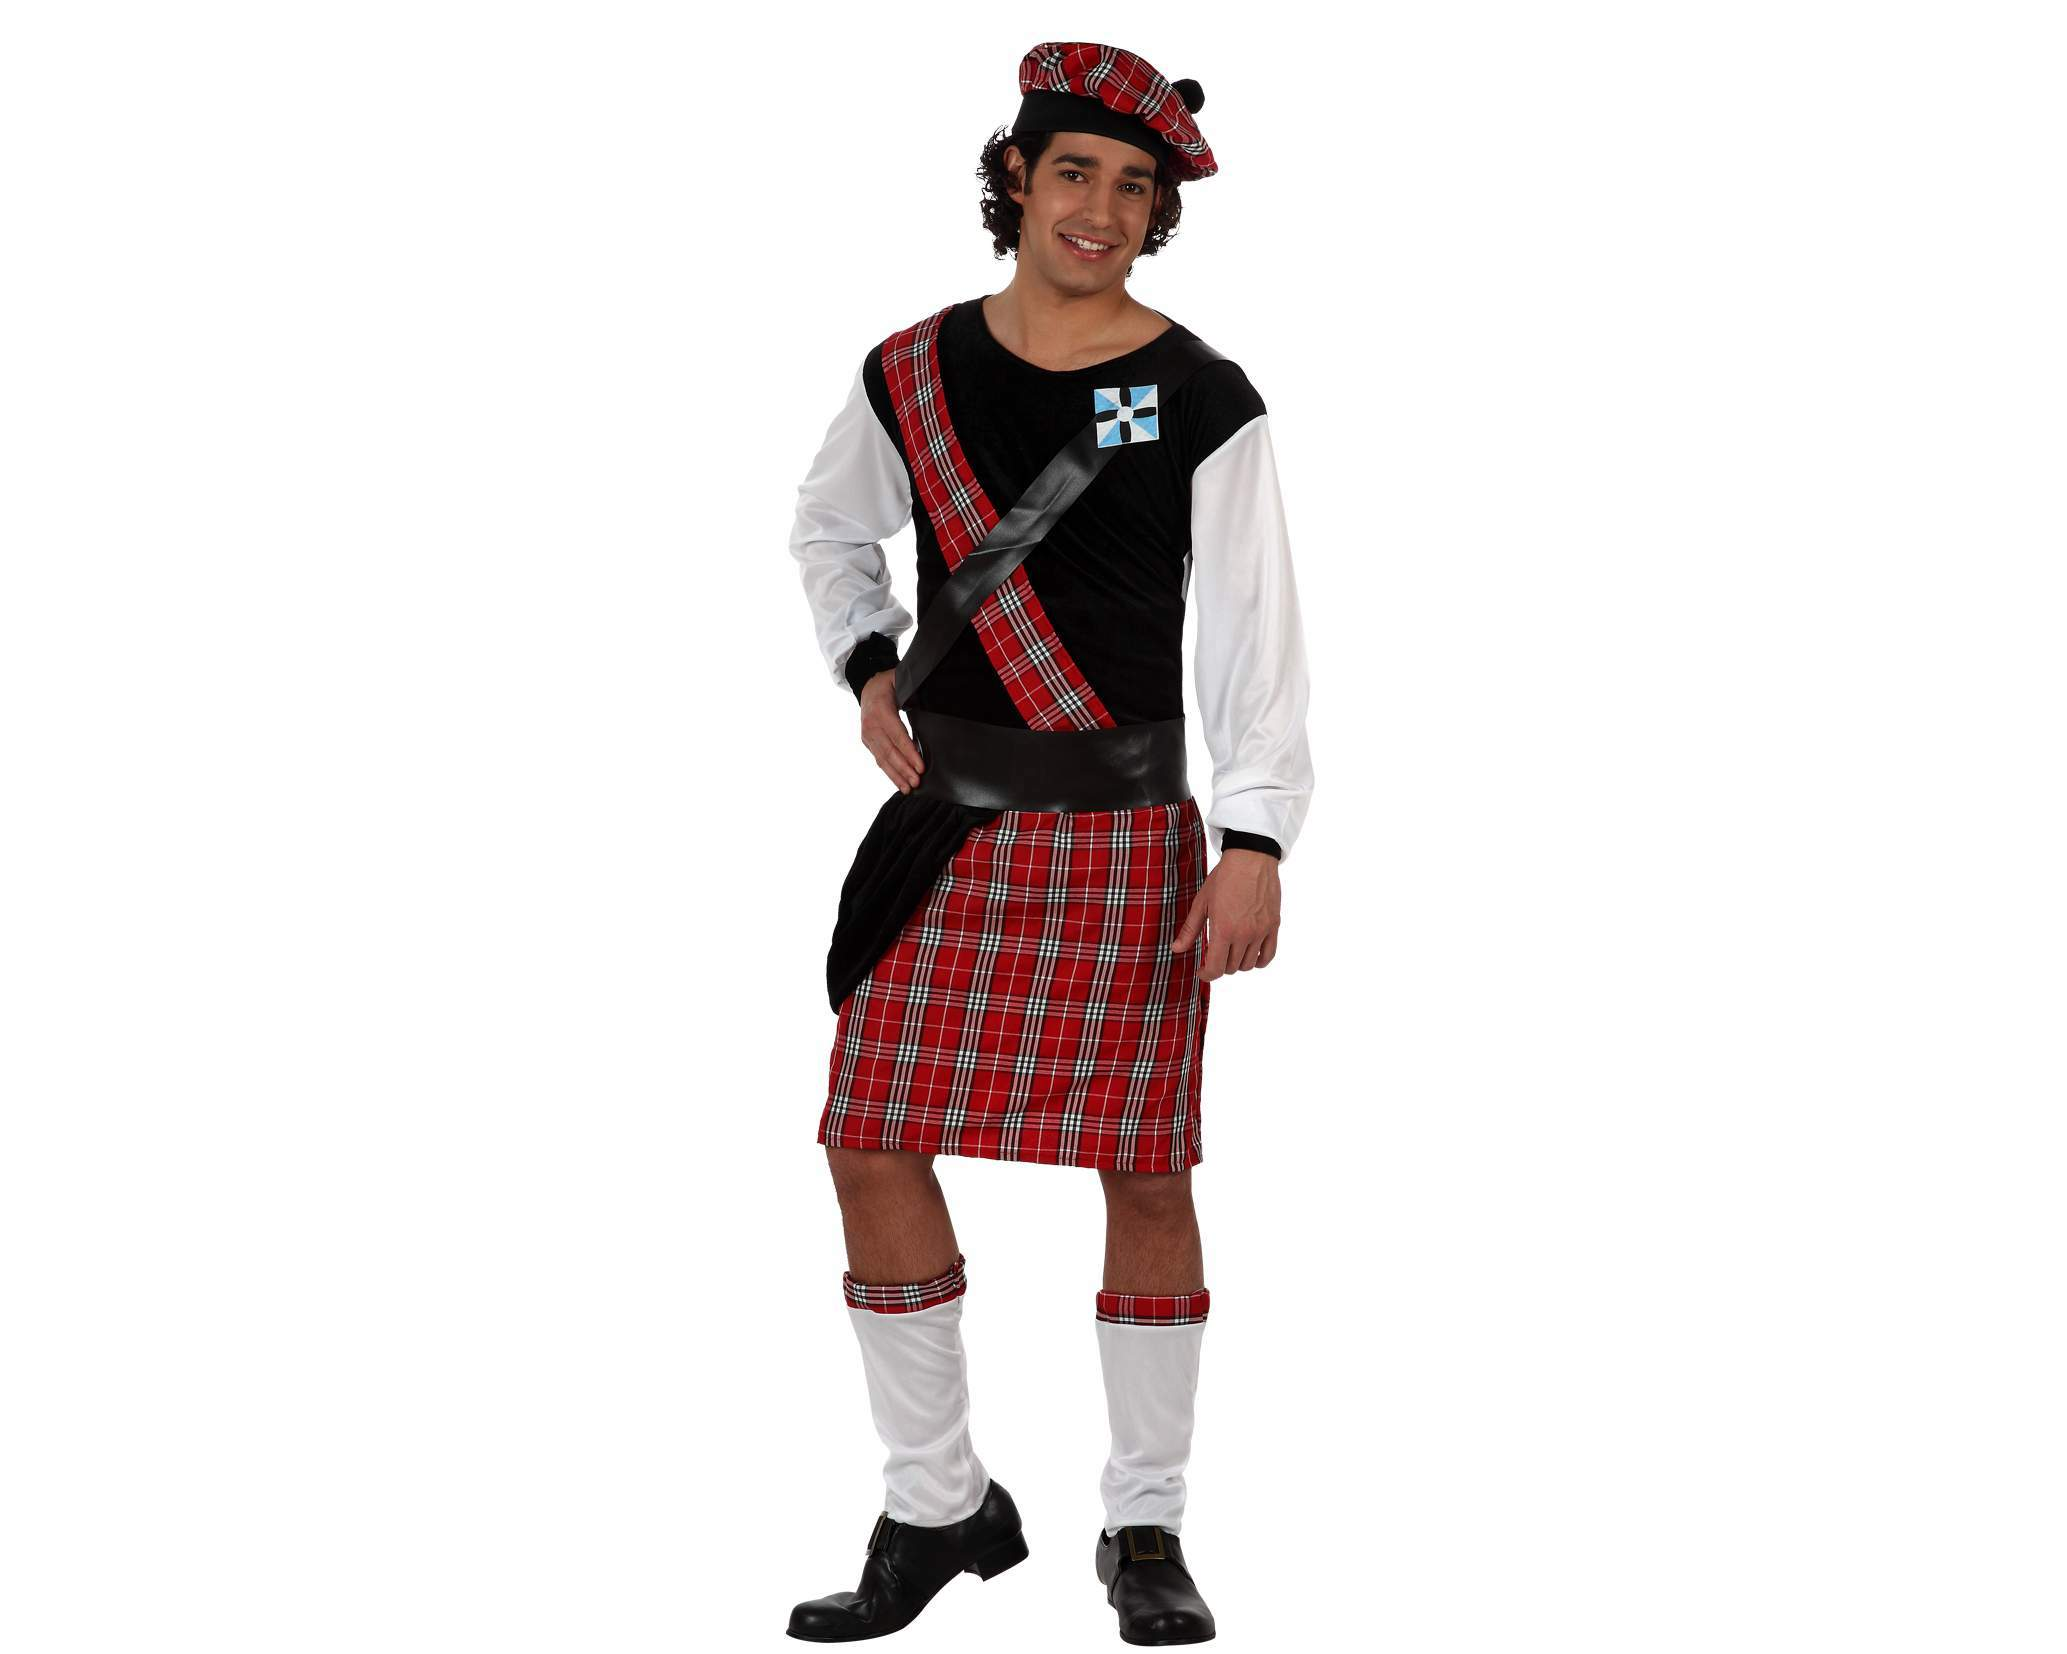 ecossais en kilt